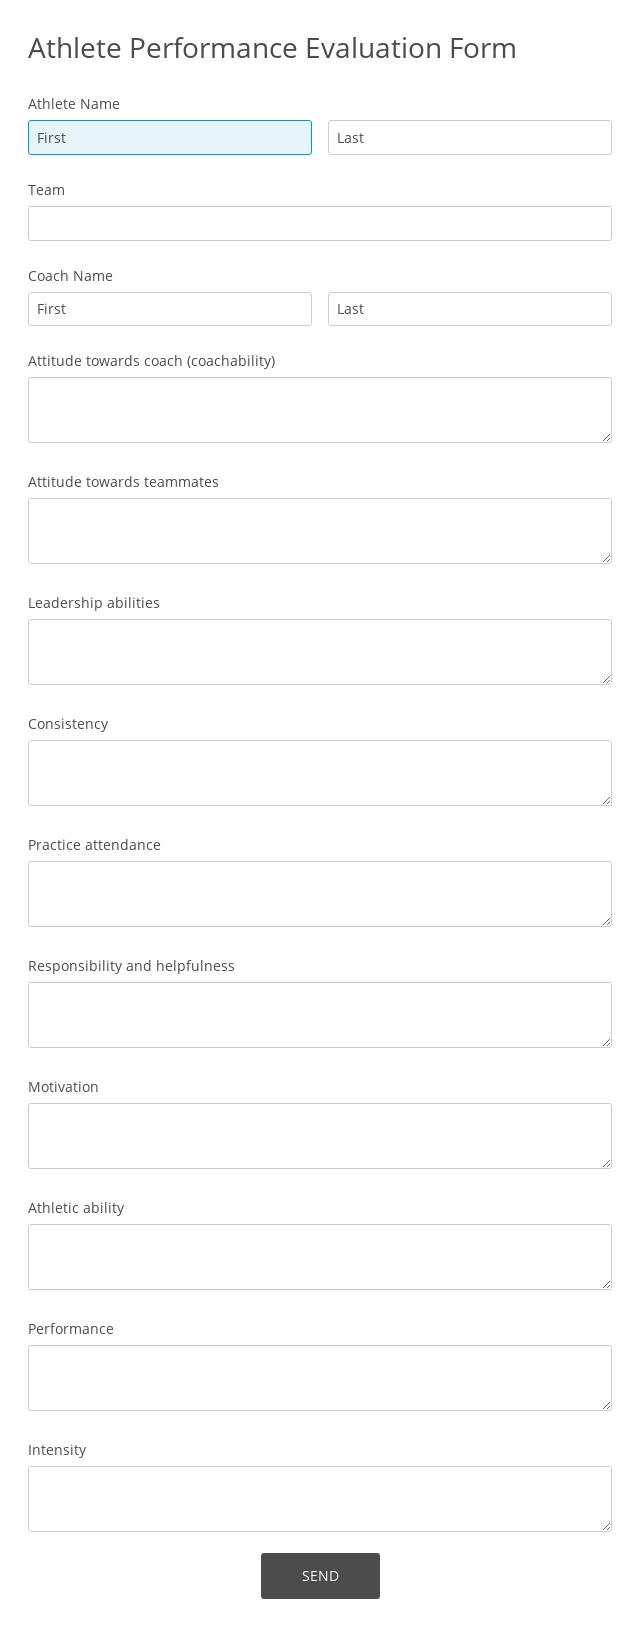 Athlete Performance Evaluation Form